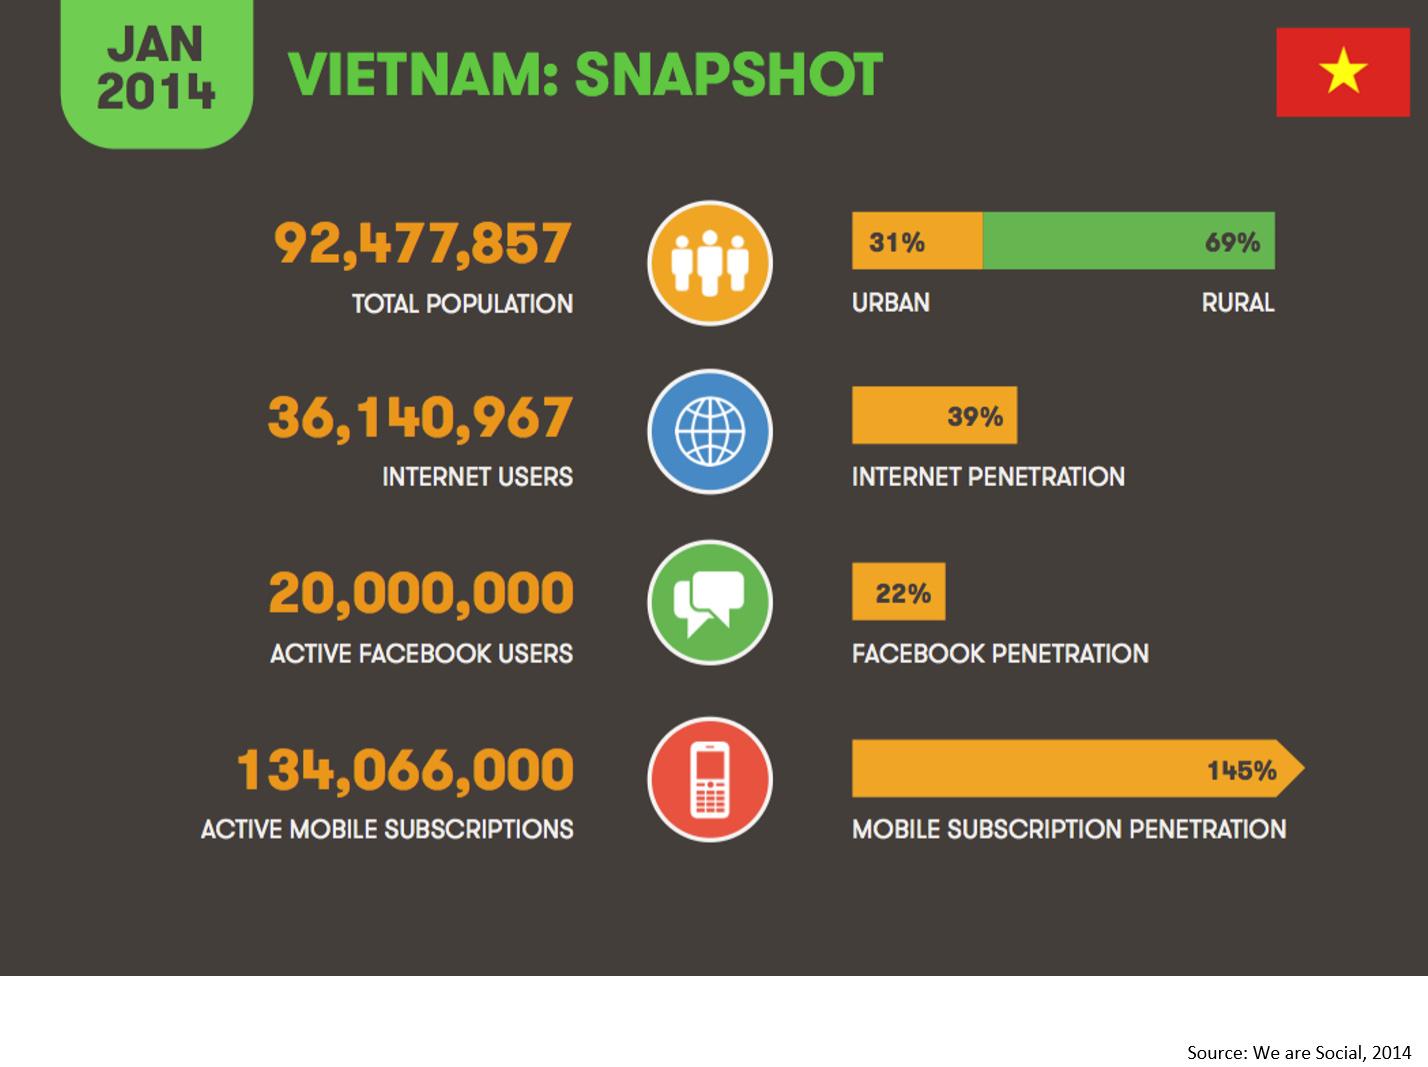 Vietnam 2014 snapshot